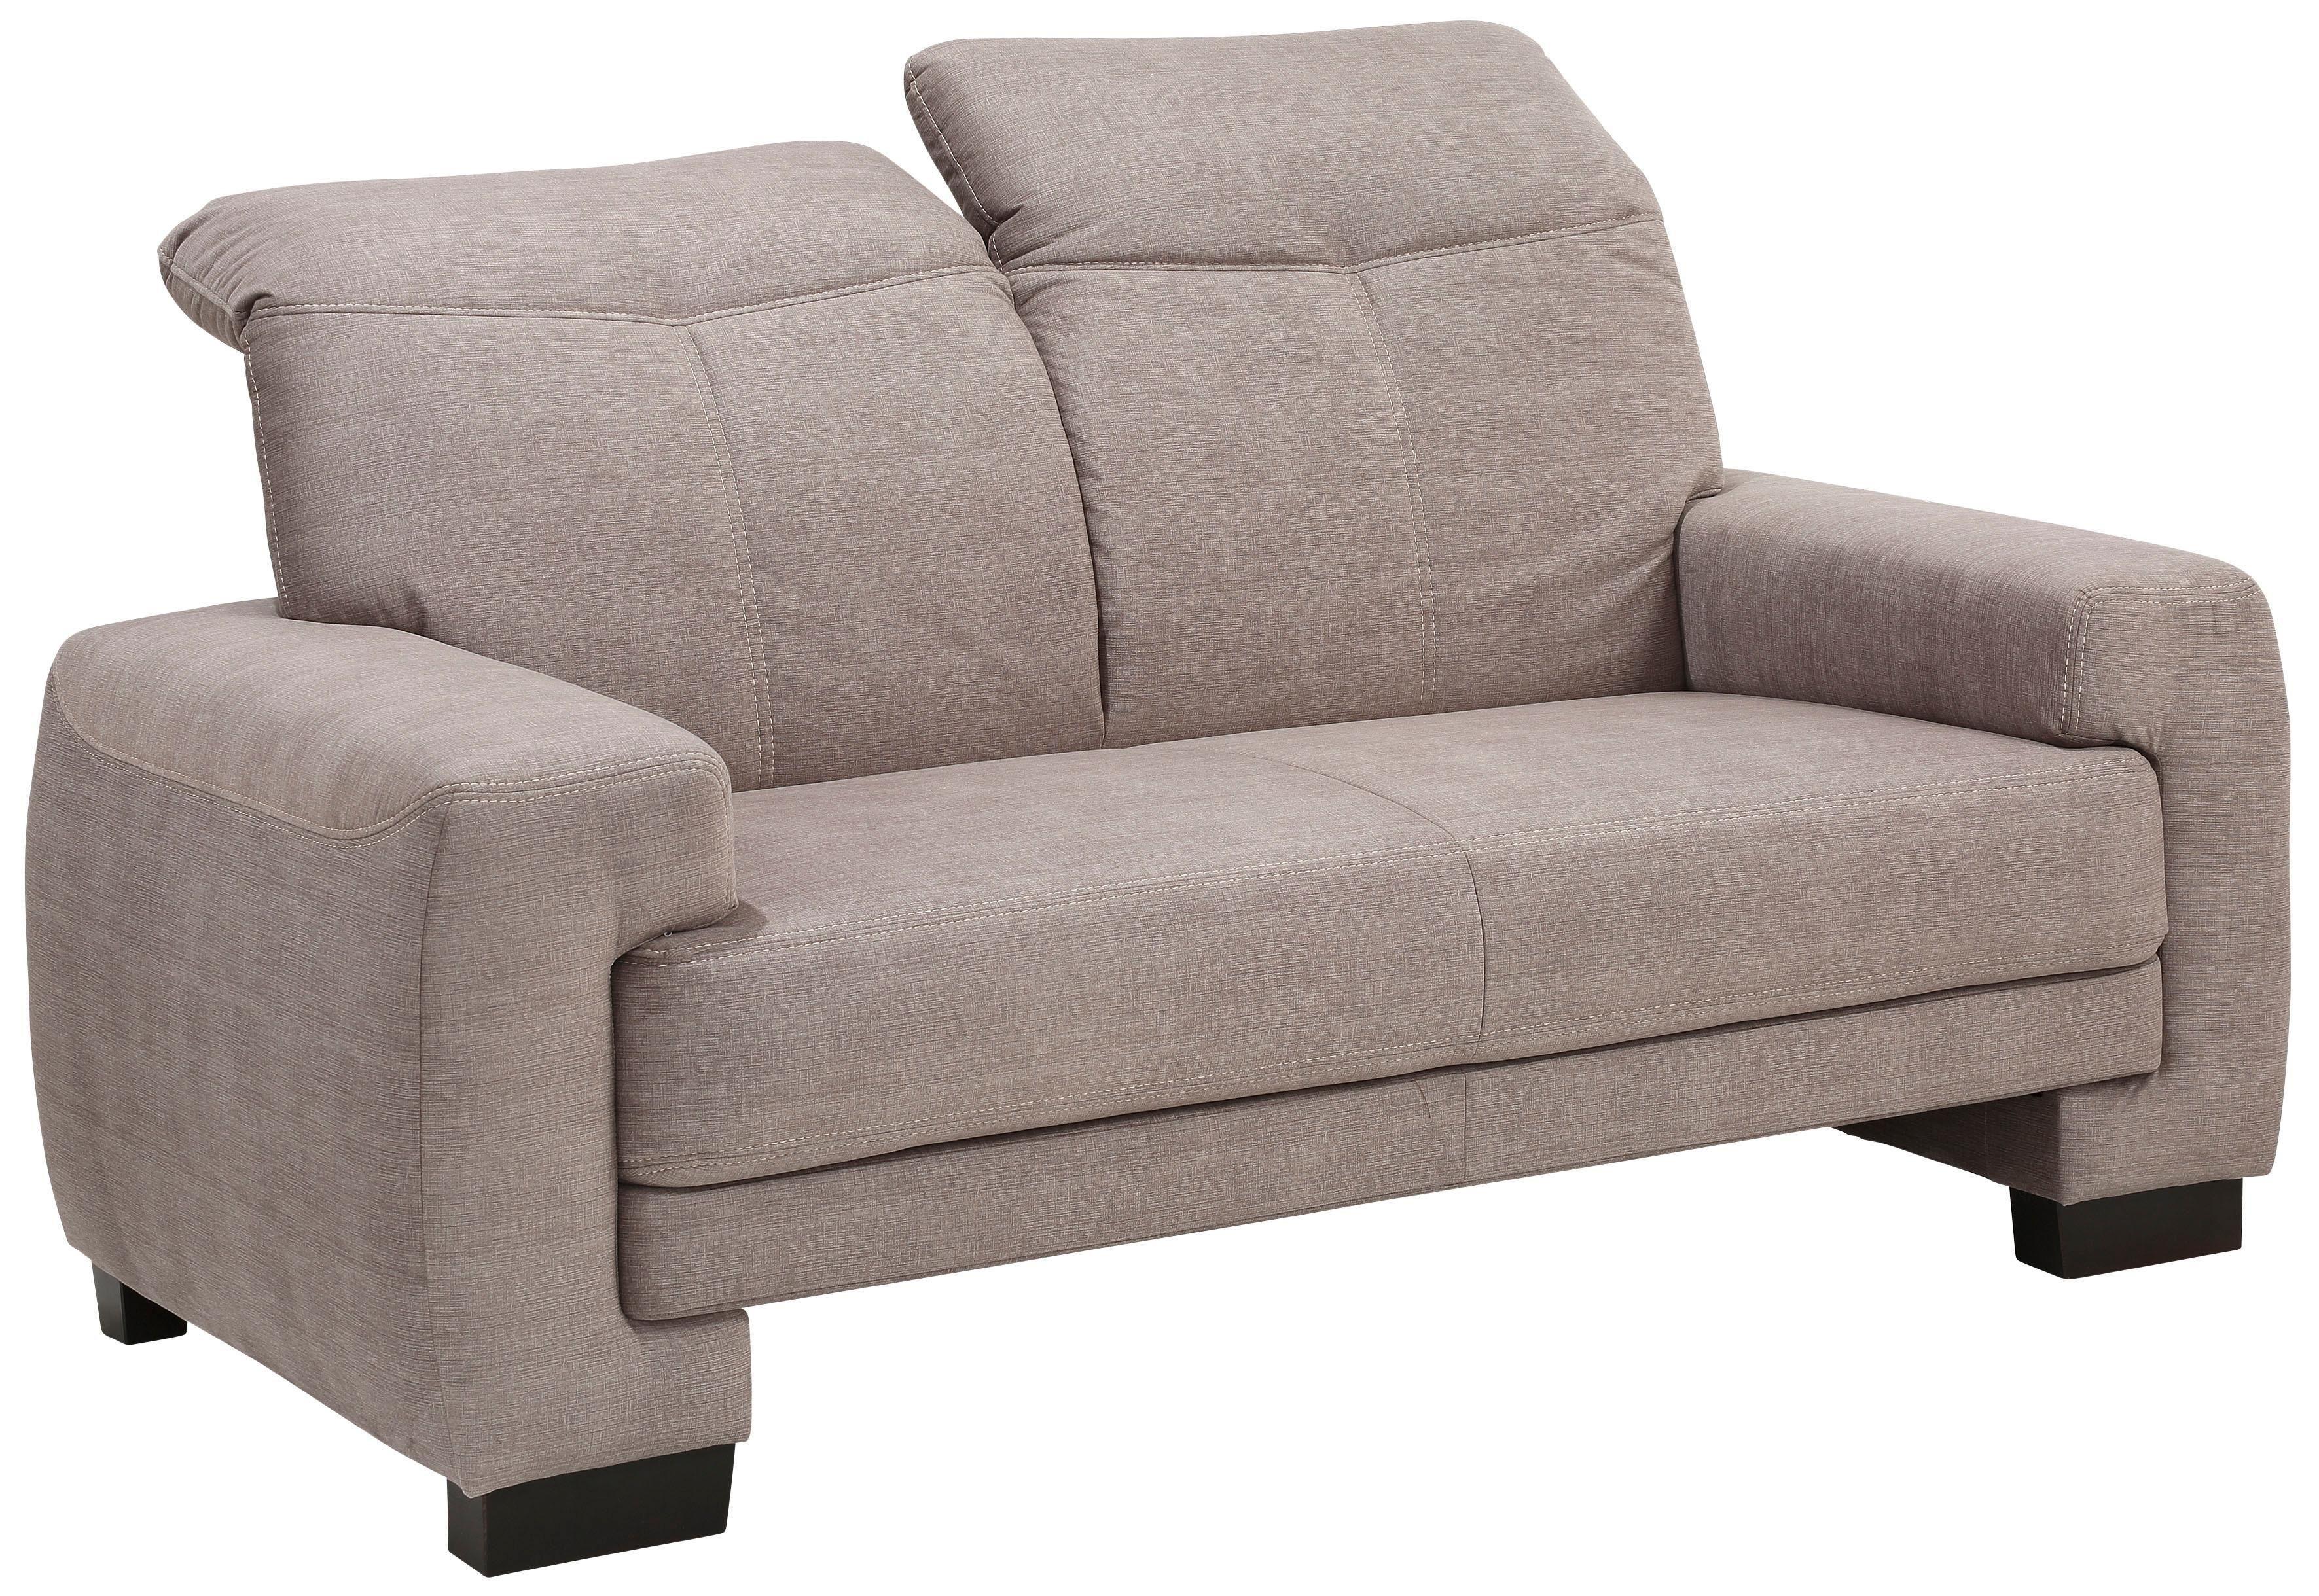 Home Affaire 2 Sitzer Napoli In 2020 2er Sofa 2 Sitzer Sofa Sofa Design